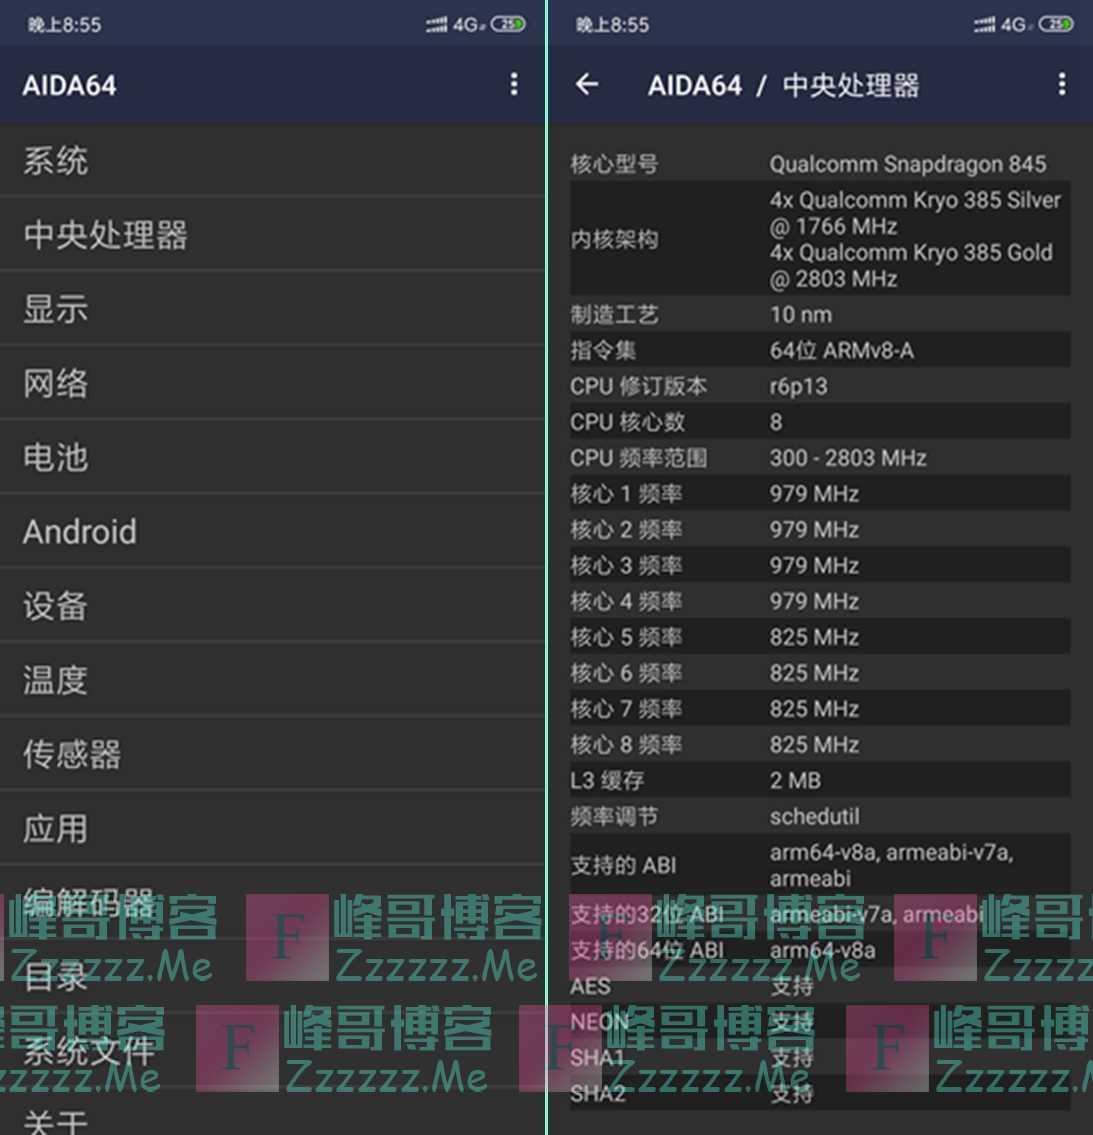 AIDA64 V1.67 安卓硬件信息检测工具下载 中文汉化高级解锁版